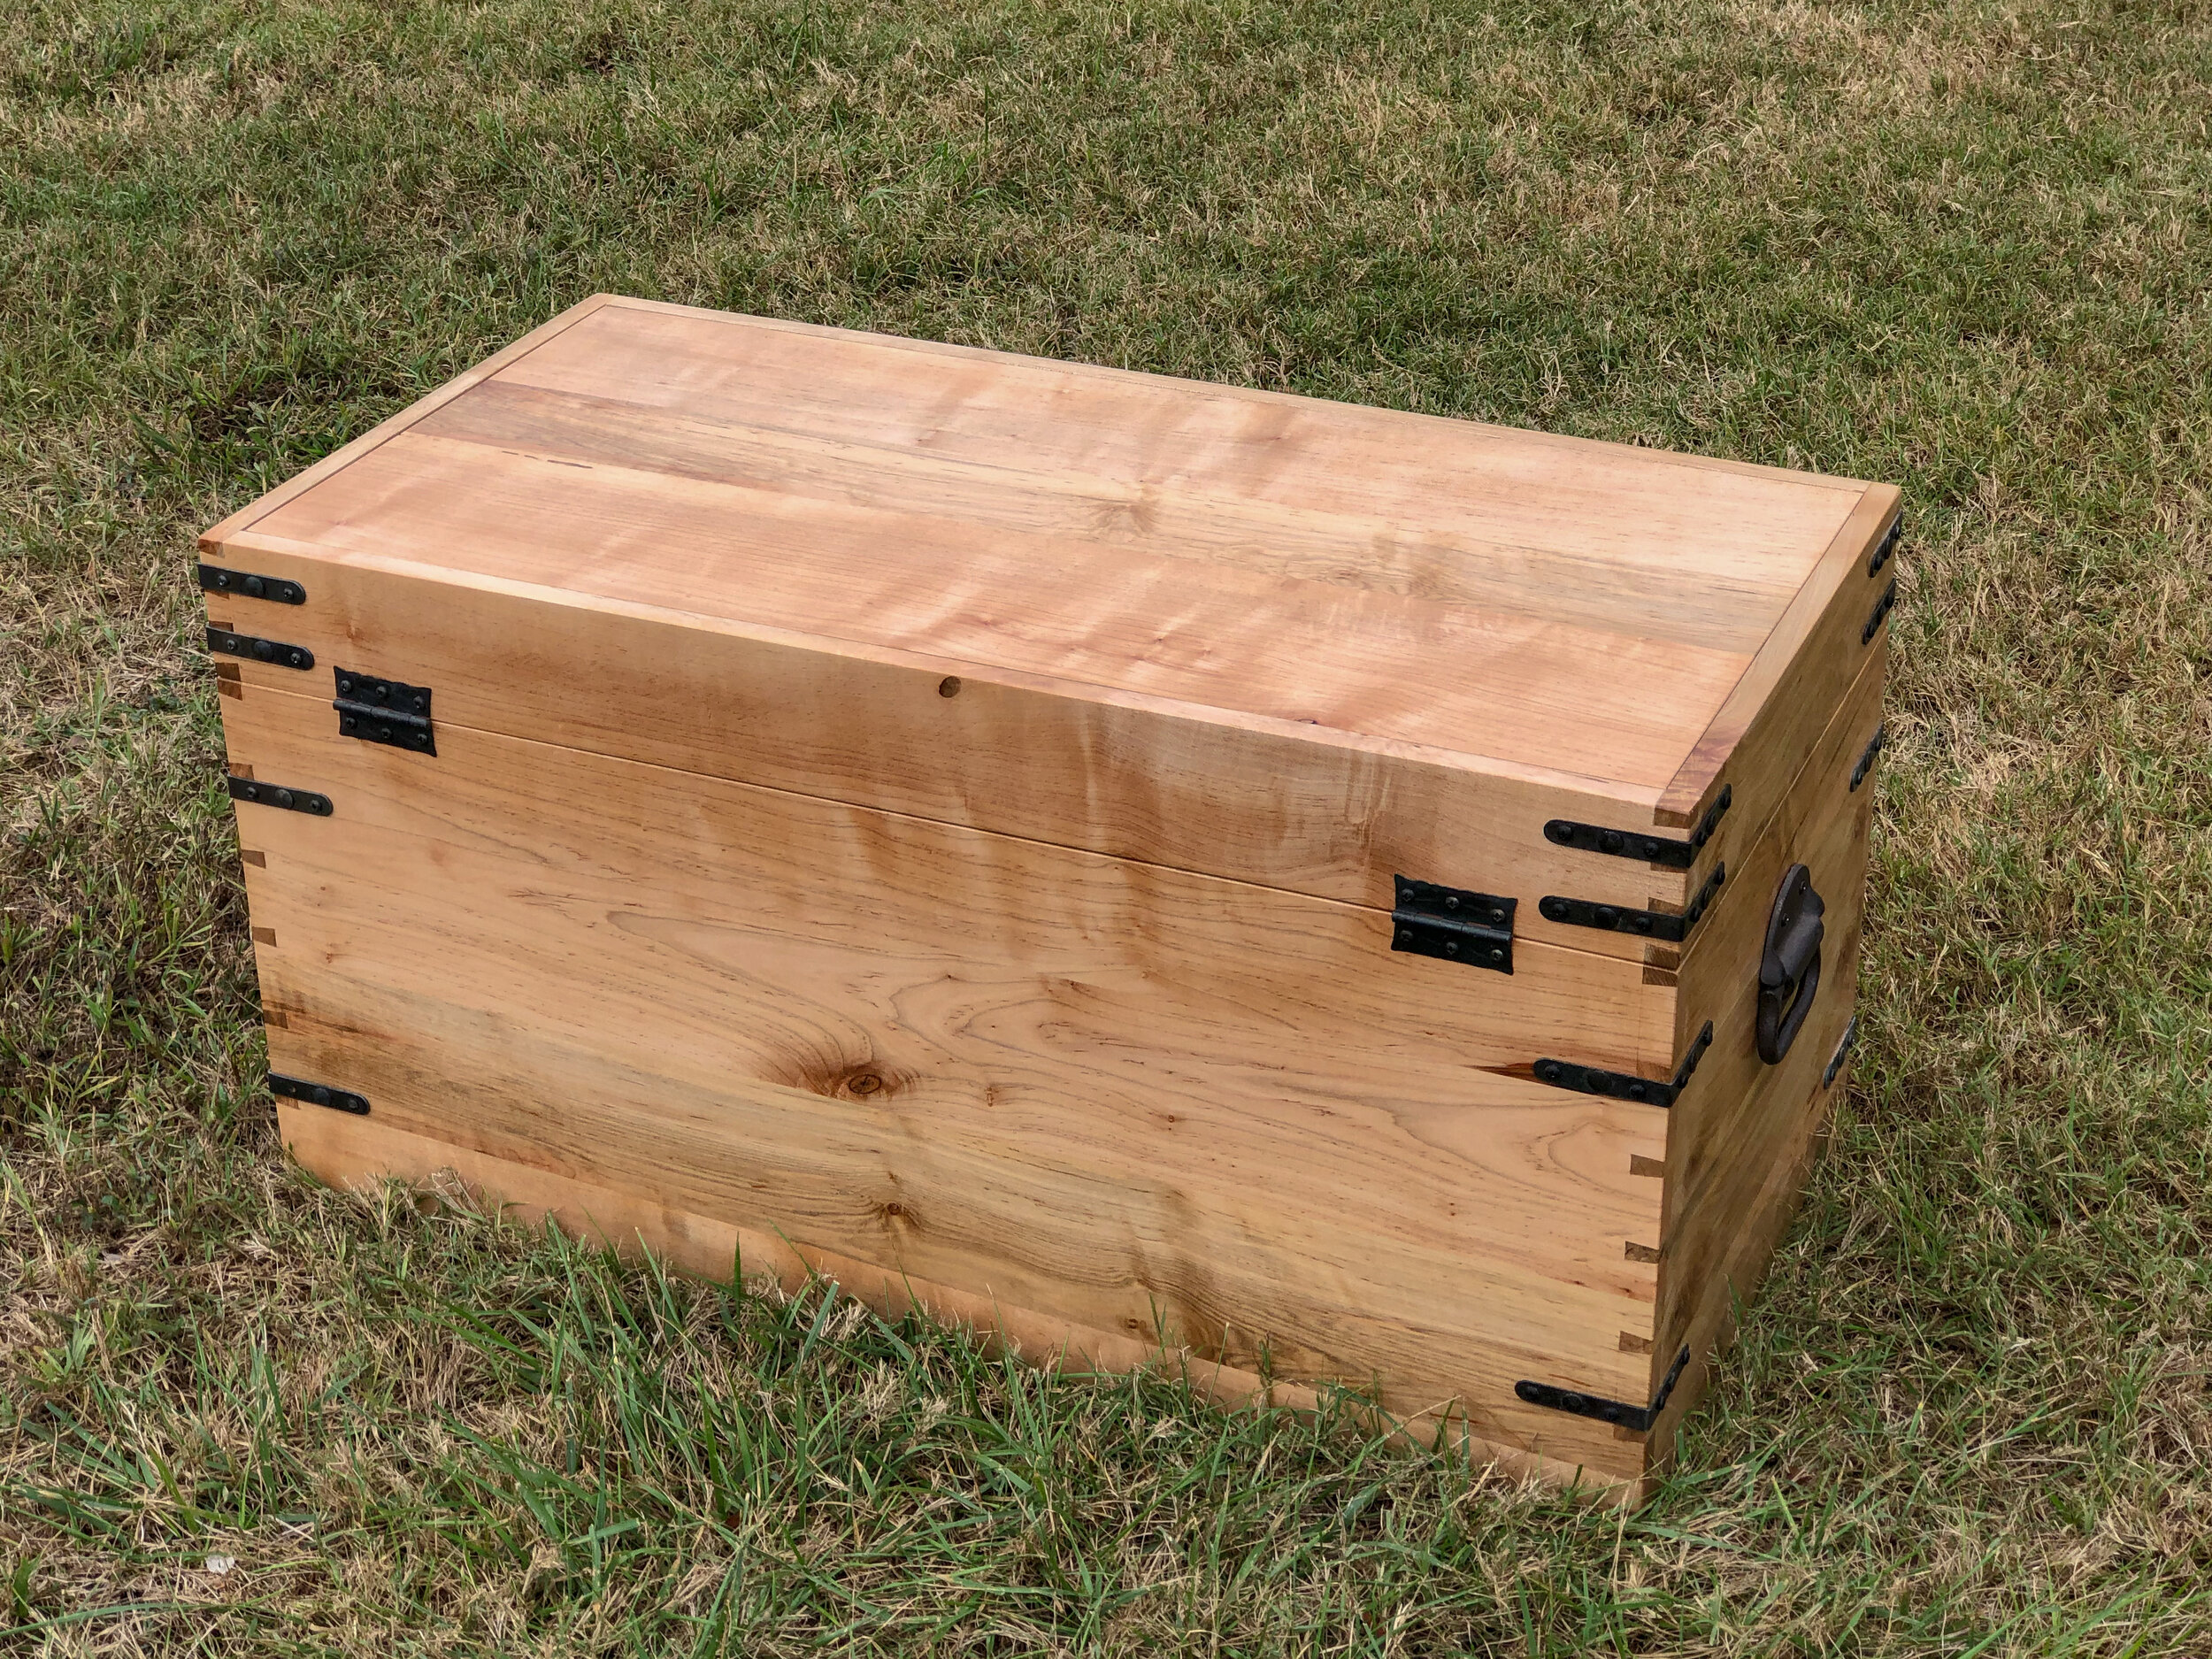 Ellis Toy Chest. Wooden Foot Locker. Maple Hope Chest. Richmond Virginia Sallie Plumley Studio Sally Plumlee Custom Hardwood Furniture